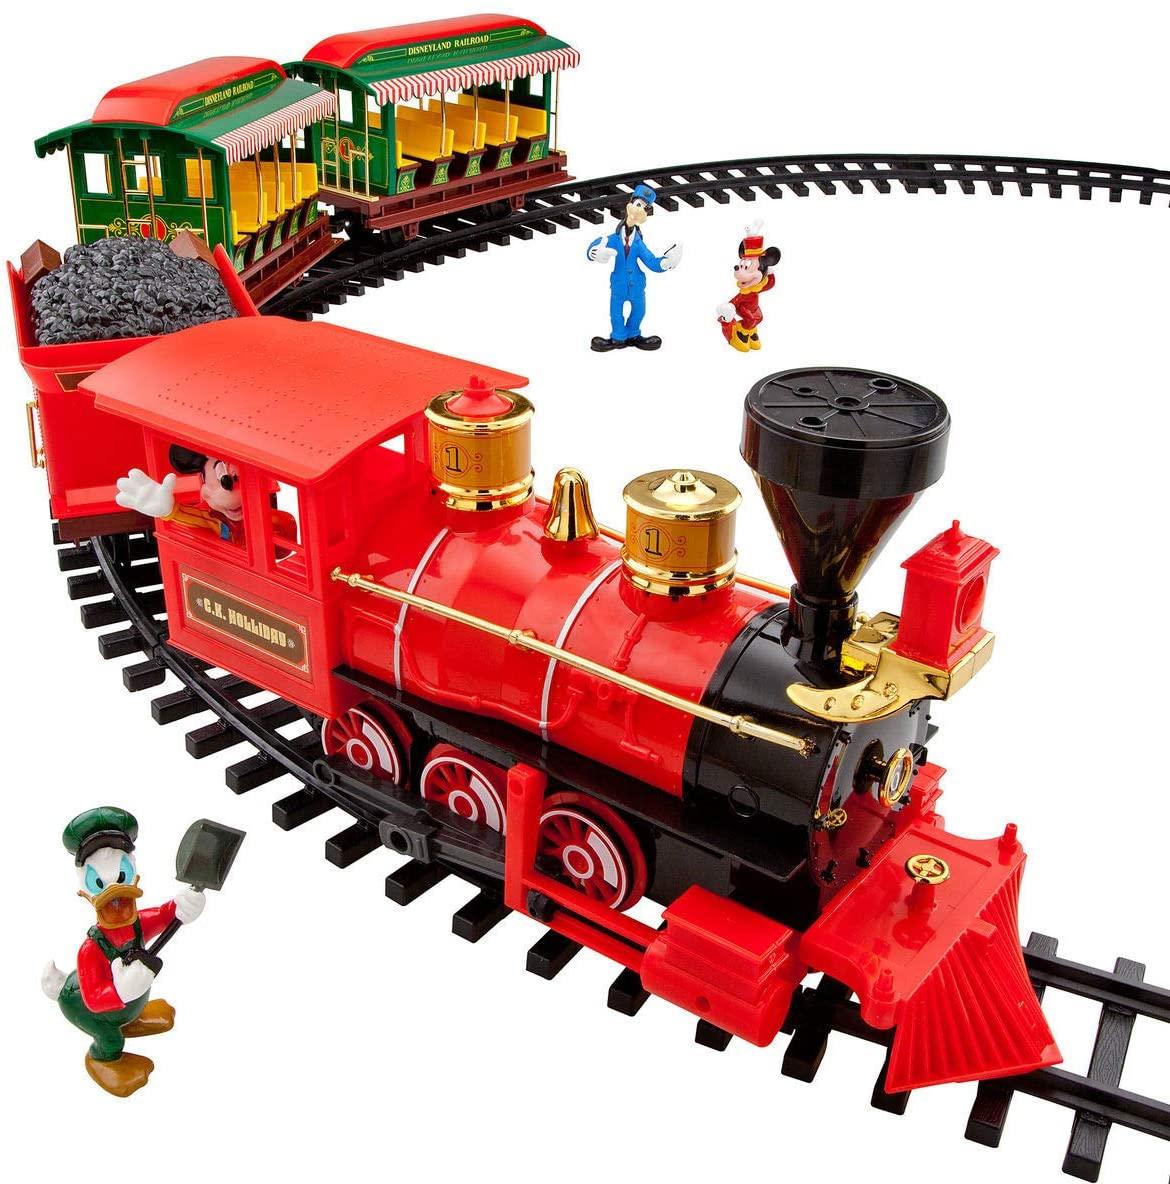 Walt Disney World Resort Railroad Train Set